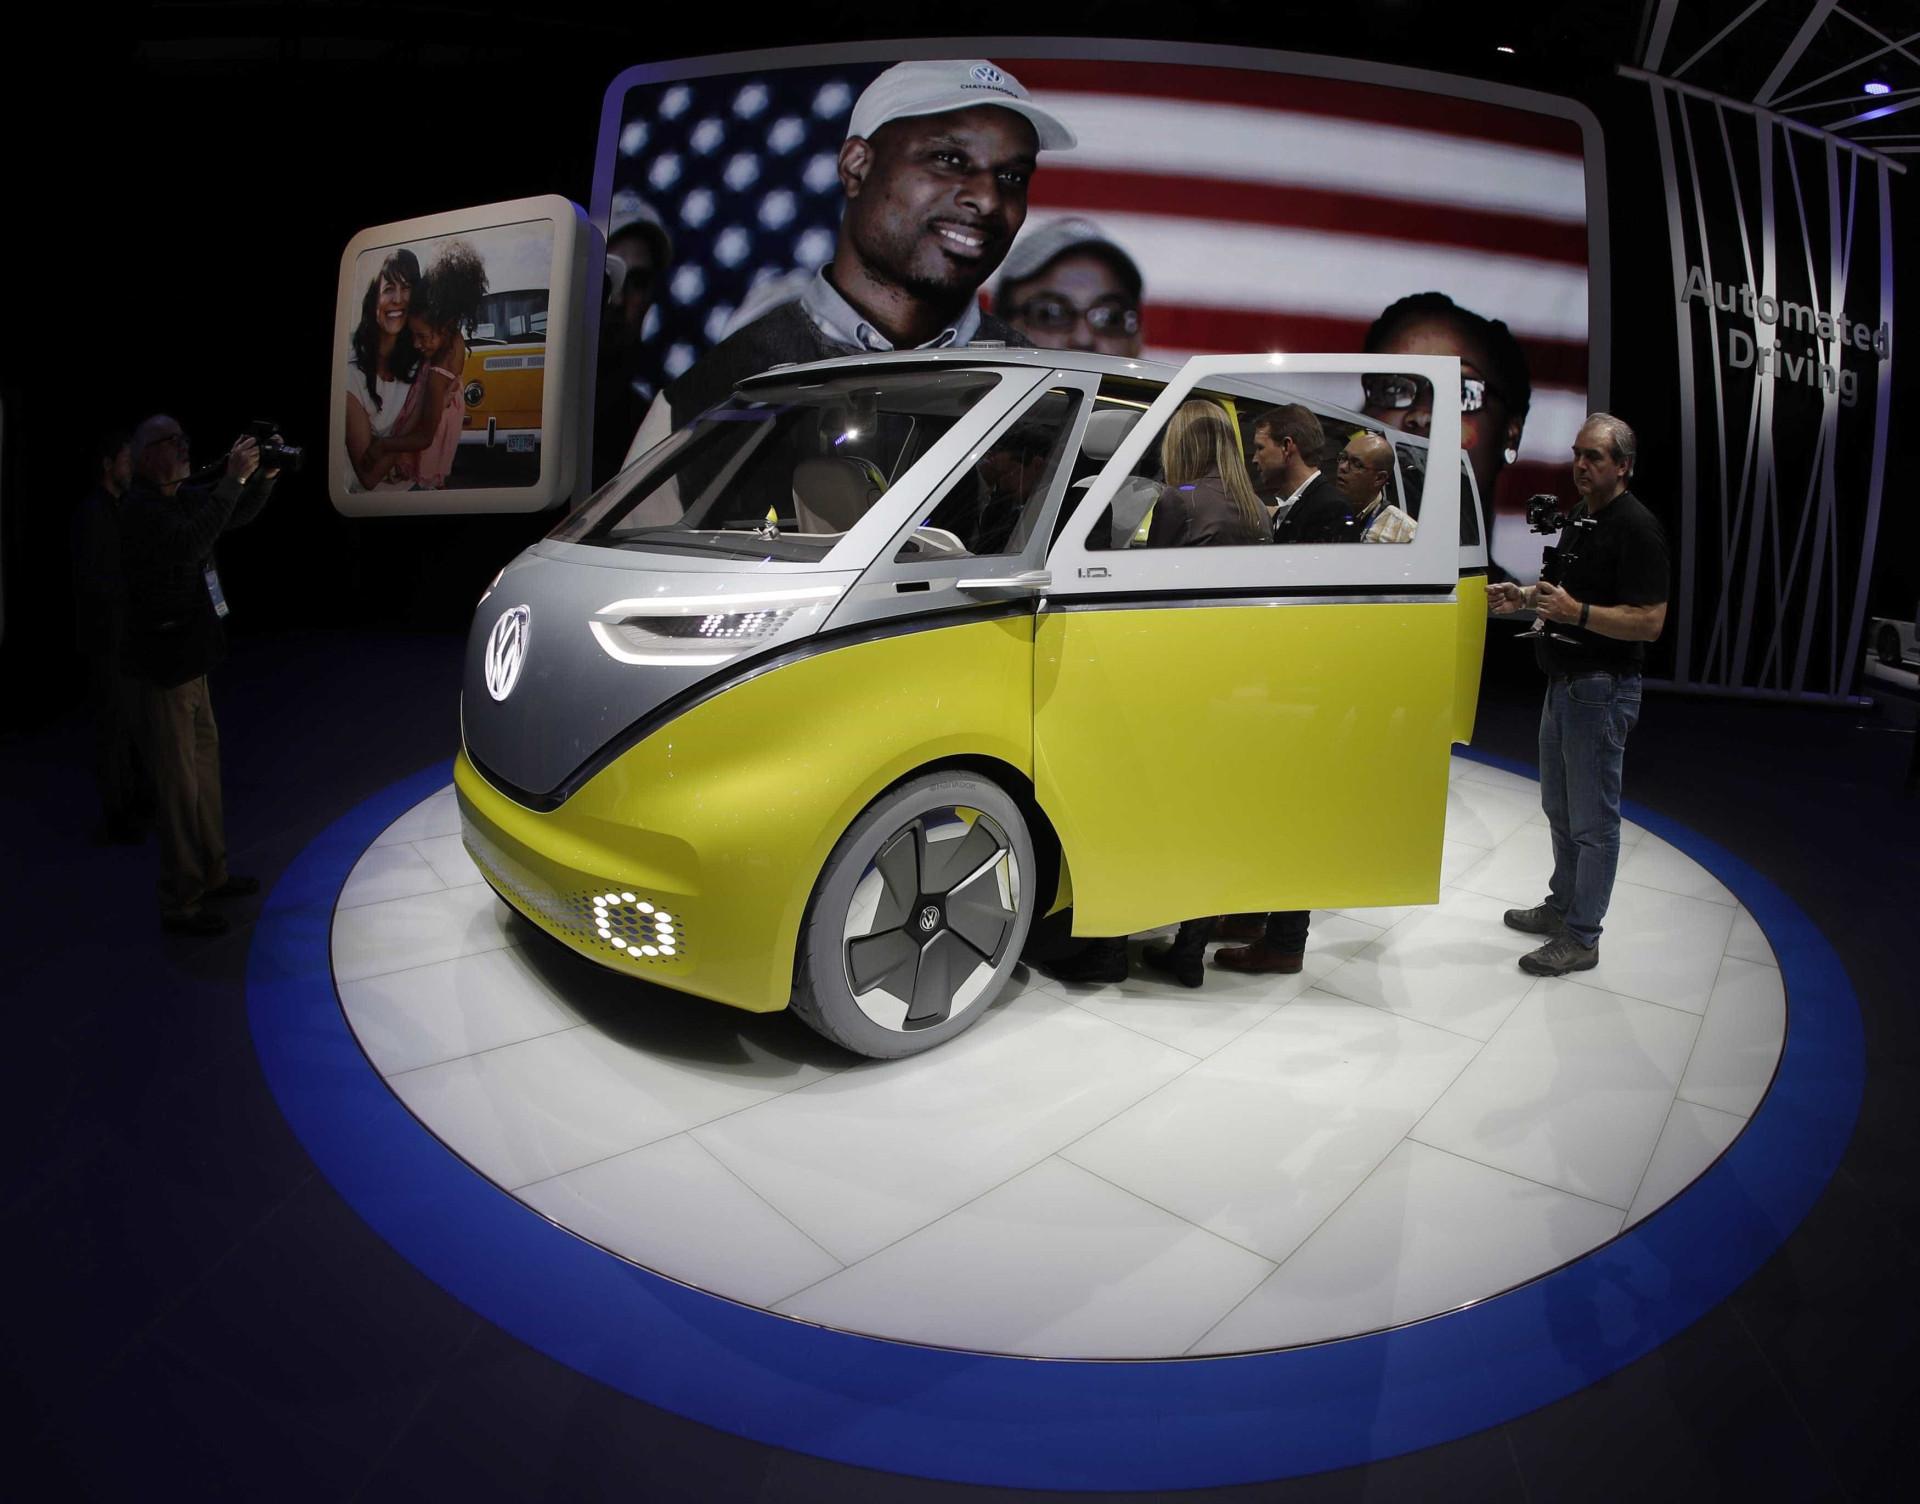 Confira os detalhes da 'Kombi' do futuro apresentada Volkswagen